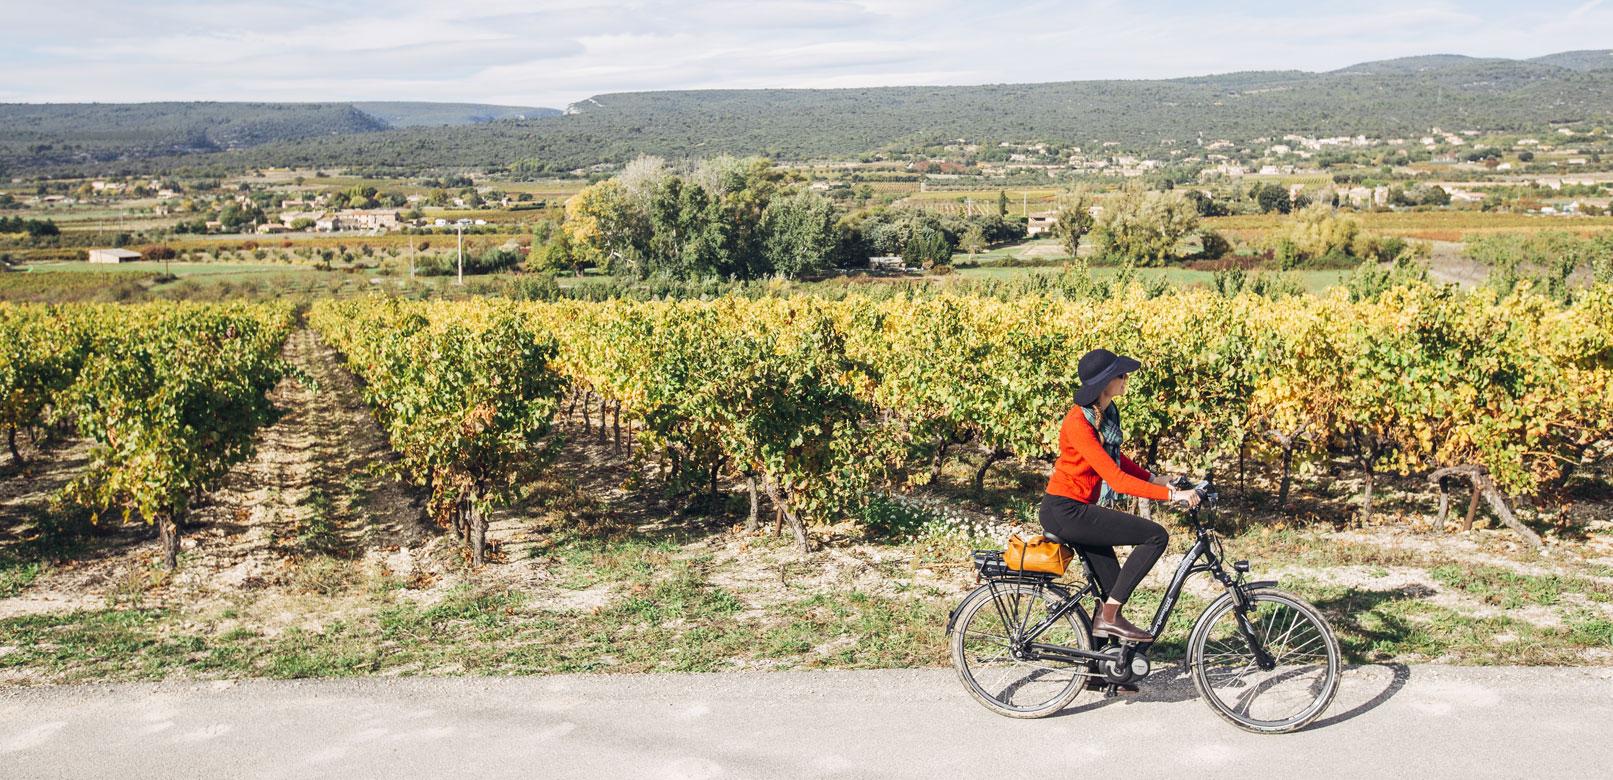 Le Luberon à vélo @Coquard